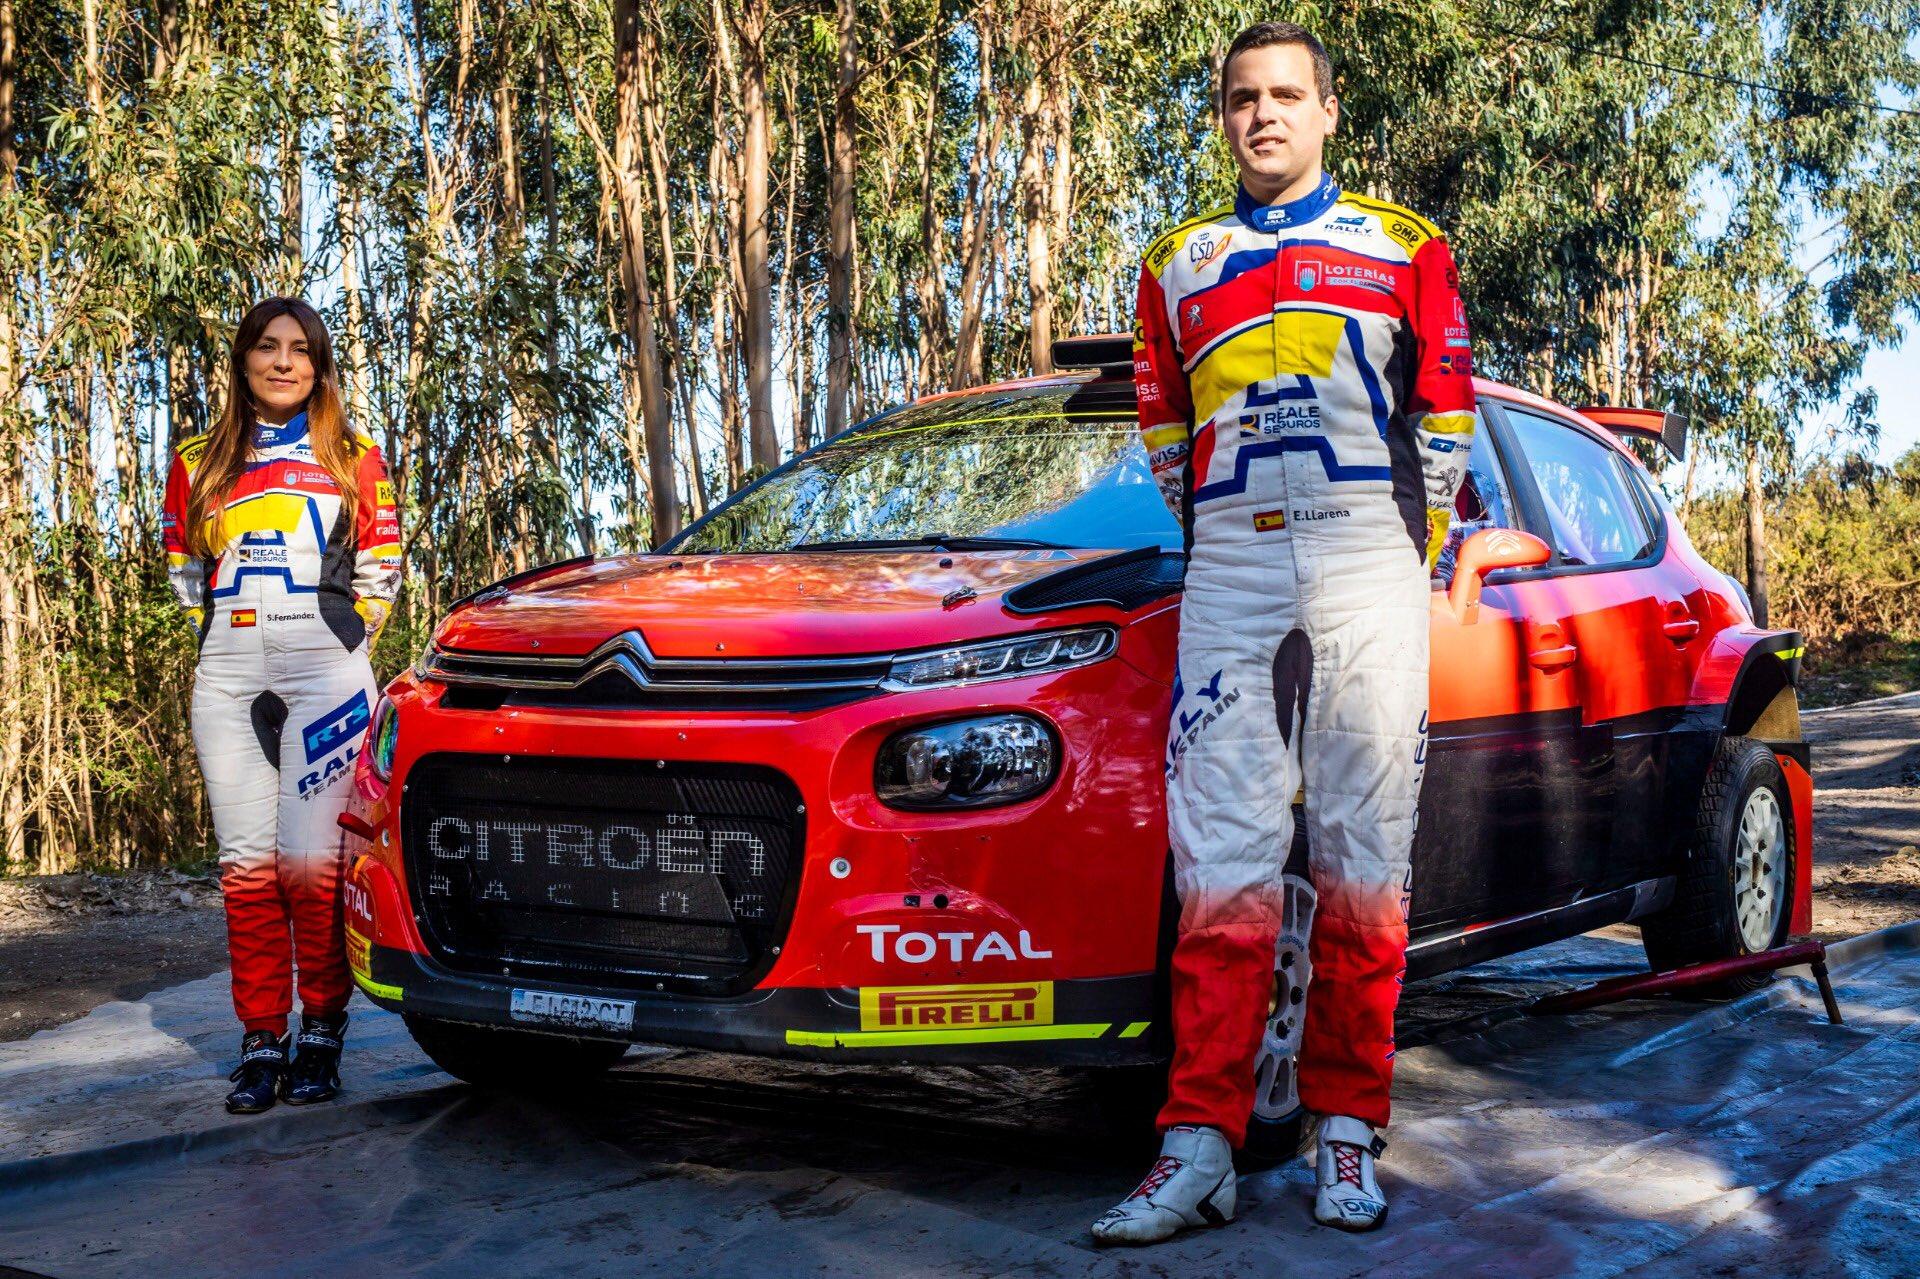 FIA European Rally Championship: Temporada 2020 - Página 4 ES1-pBhXkAg0zfU?format=jpg&name=large